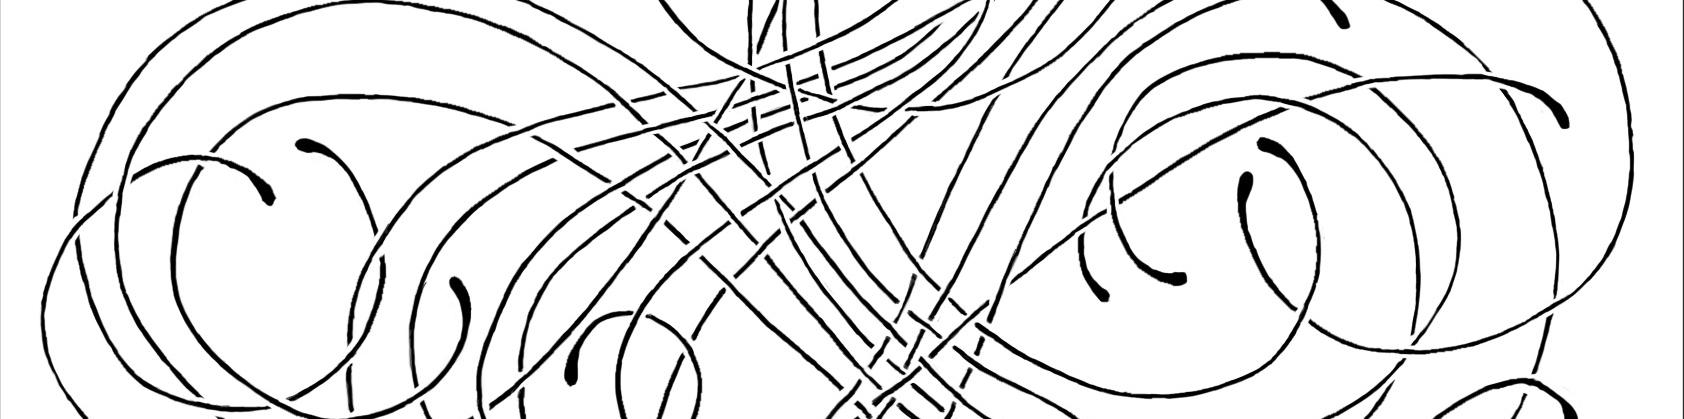 ampersand sketch